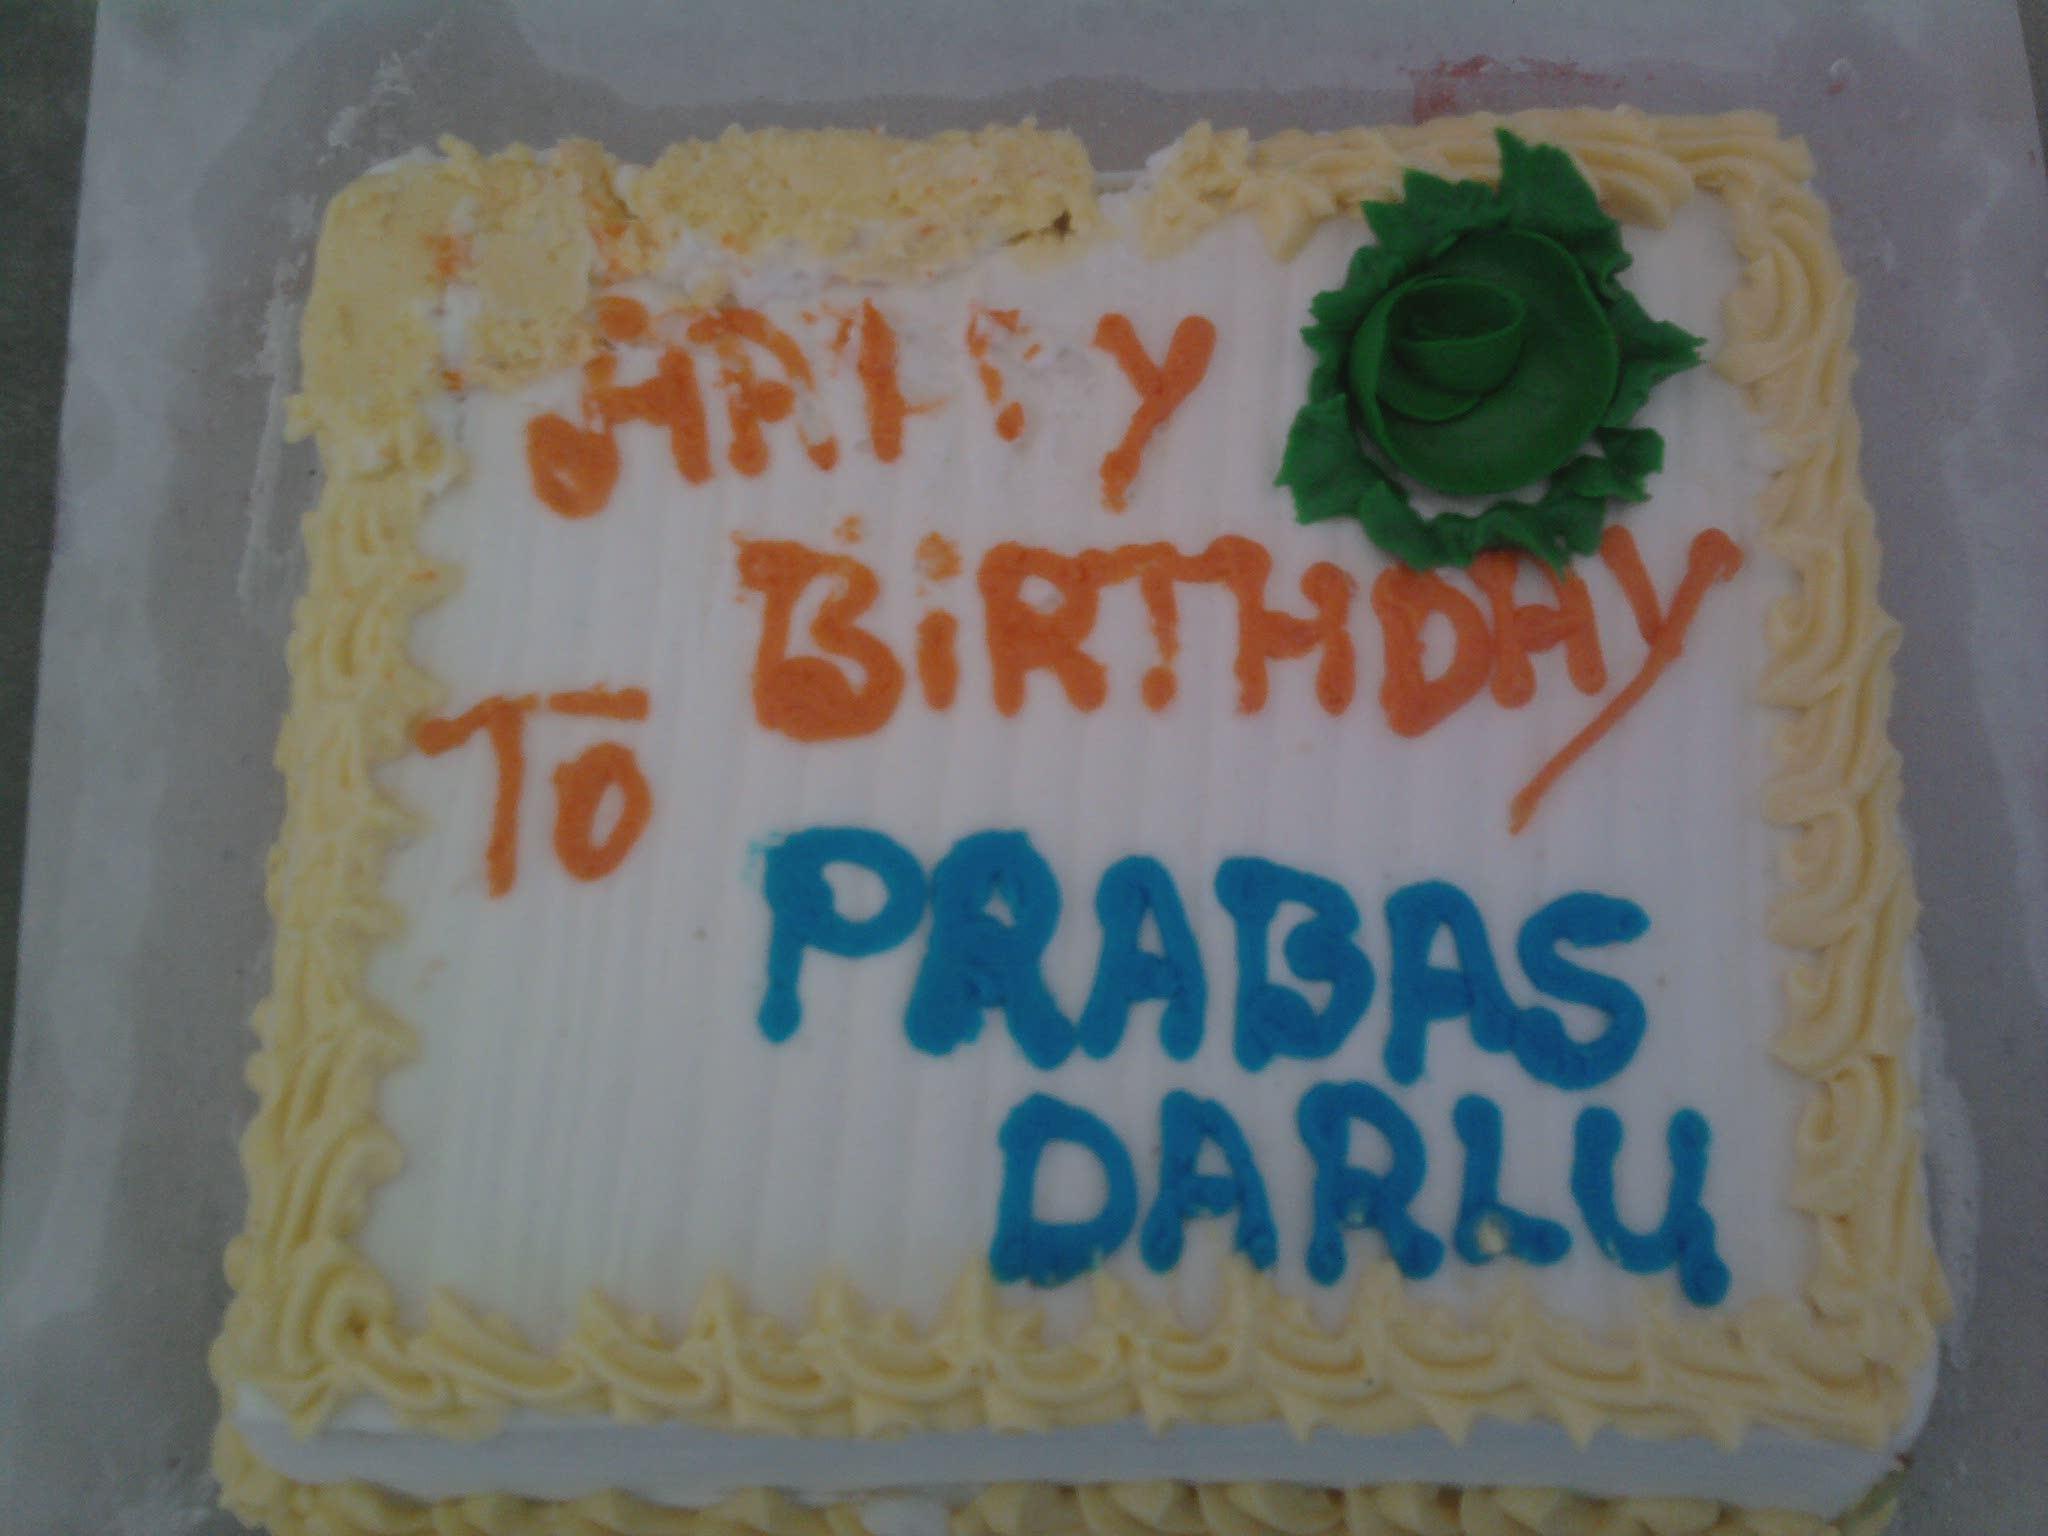 hi.prabhas darlu.this cake s 4 u 4m ur fans-bangalore